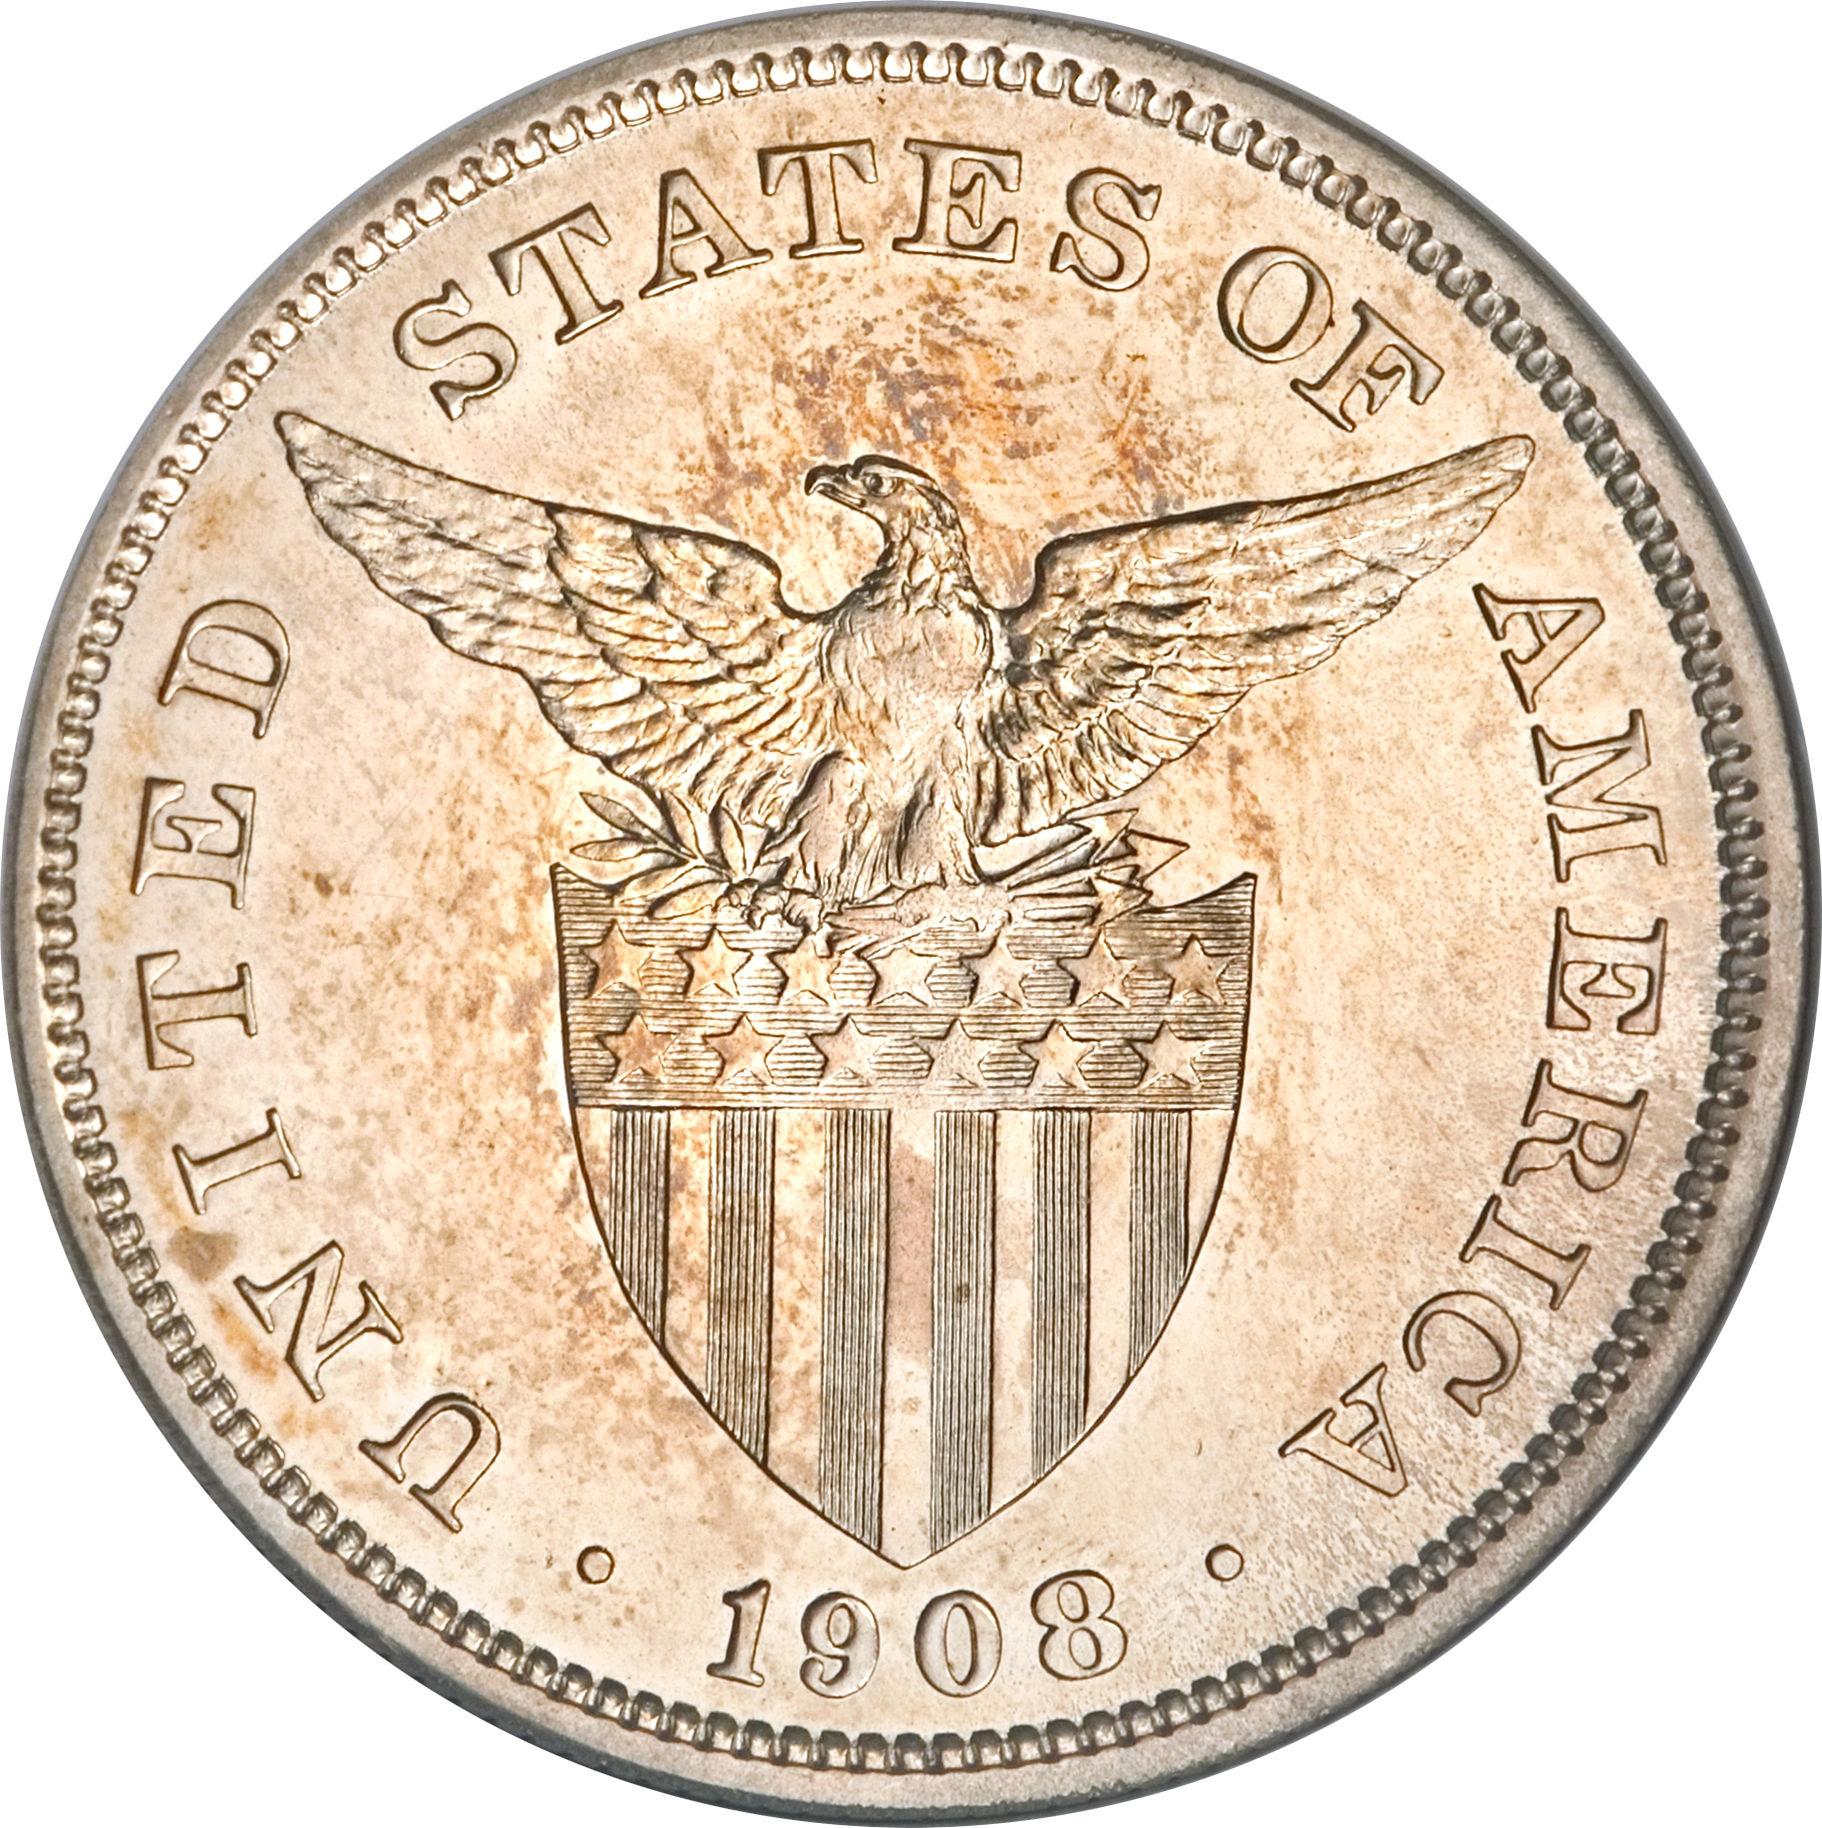 1 Peso U S Administration